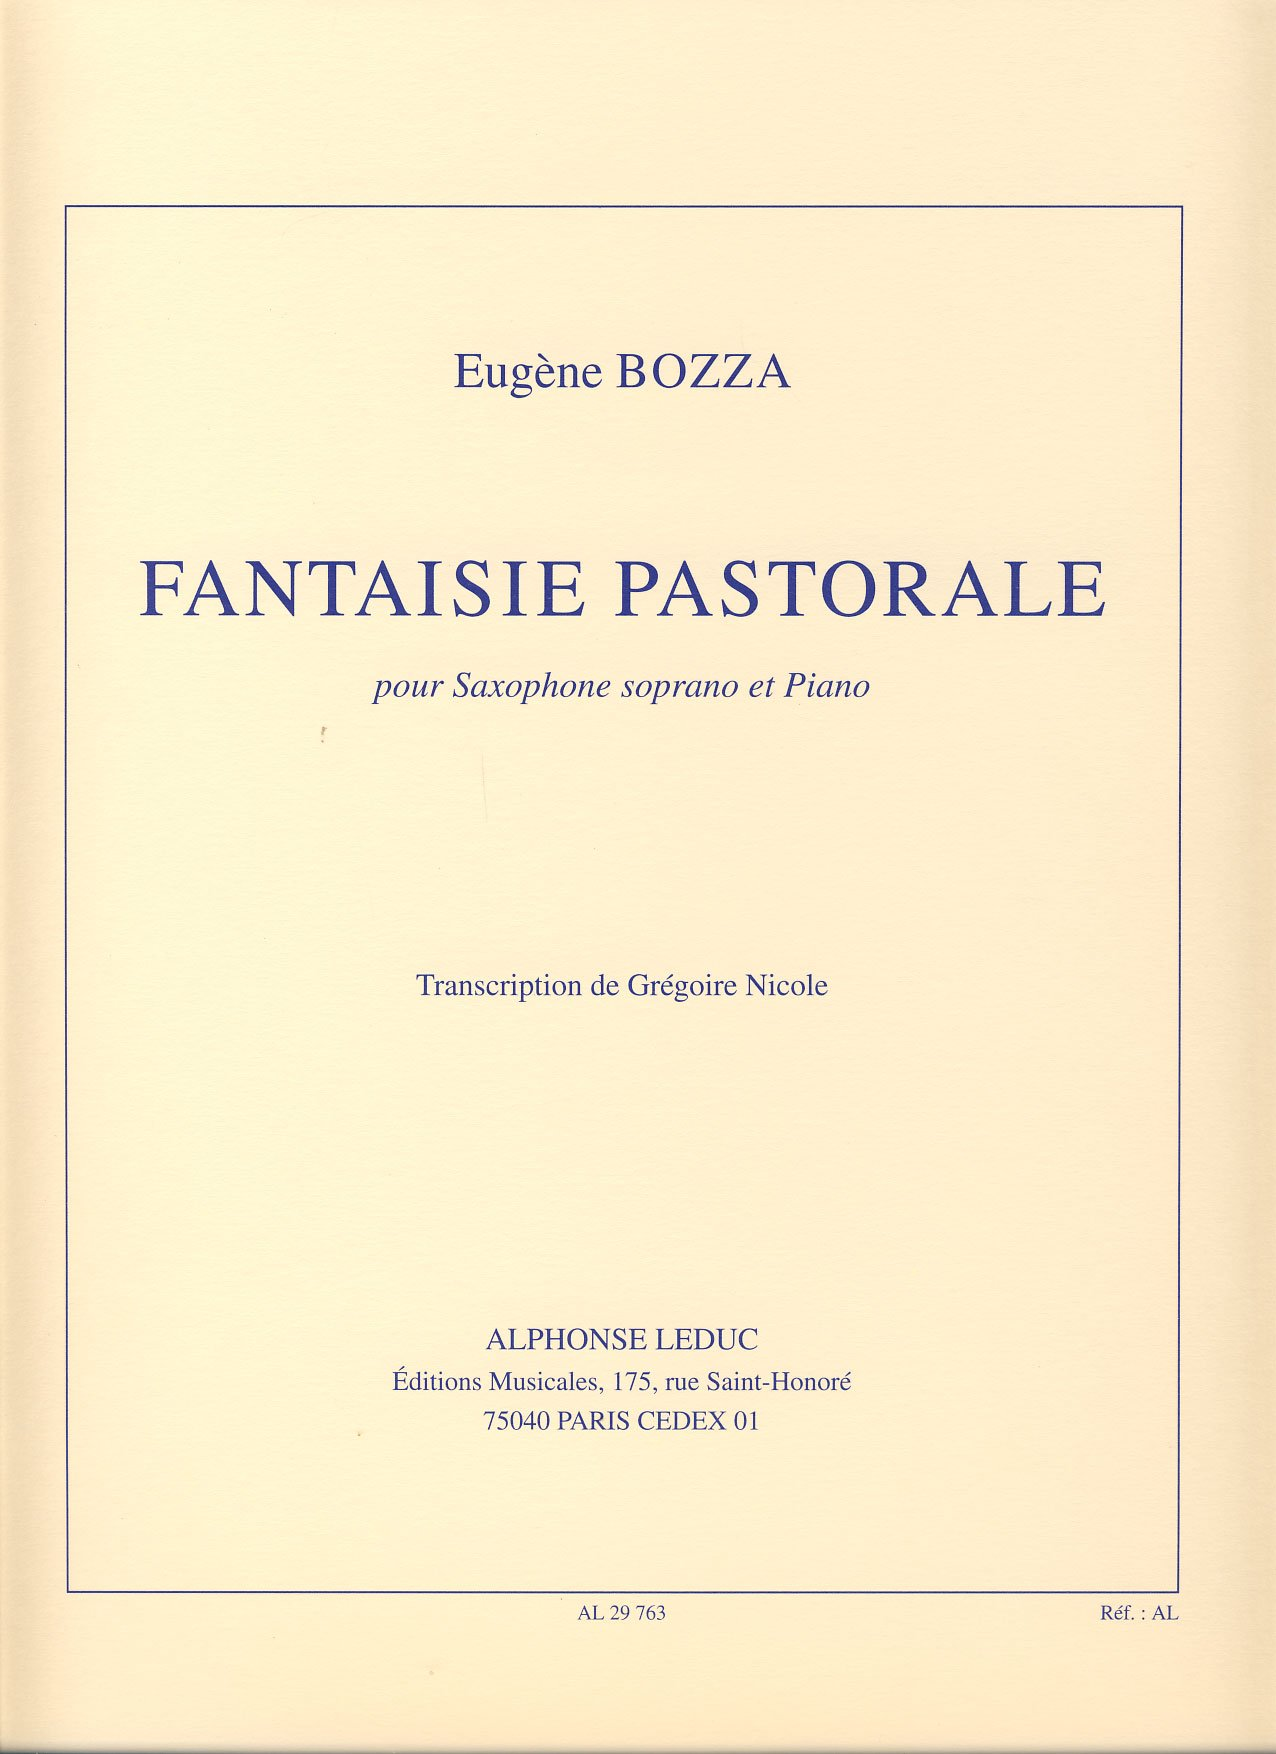 FANTAISIE PASTORALE BOZZA EPUB DOWNLOAD